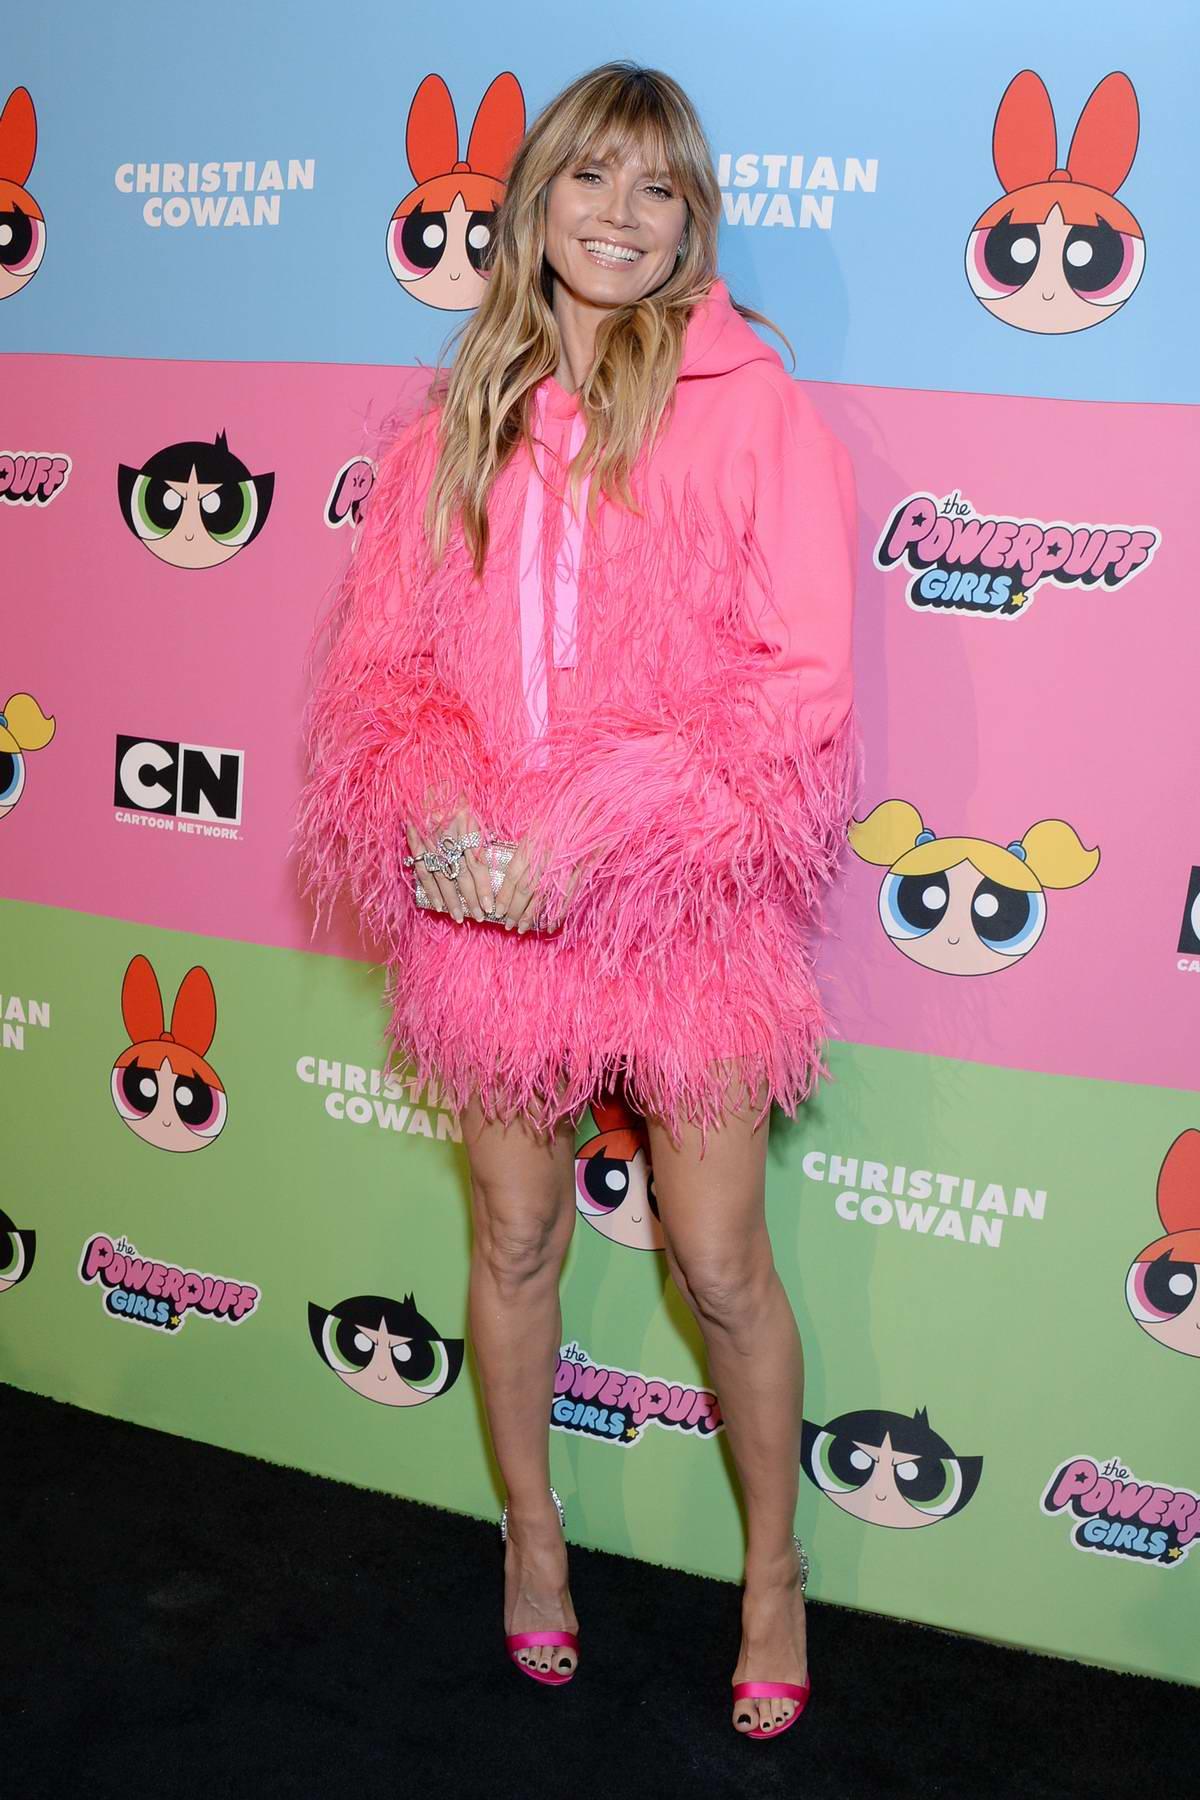 Heidi Klum attends Christian Cowan x Powerpuff Girls Runway Show in Los Angeles